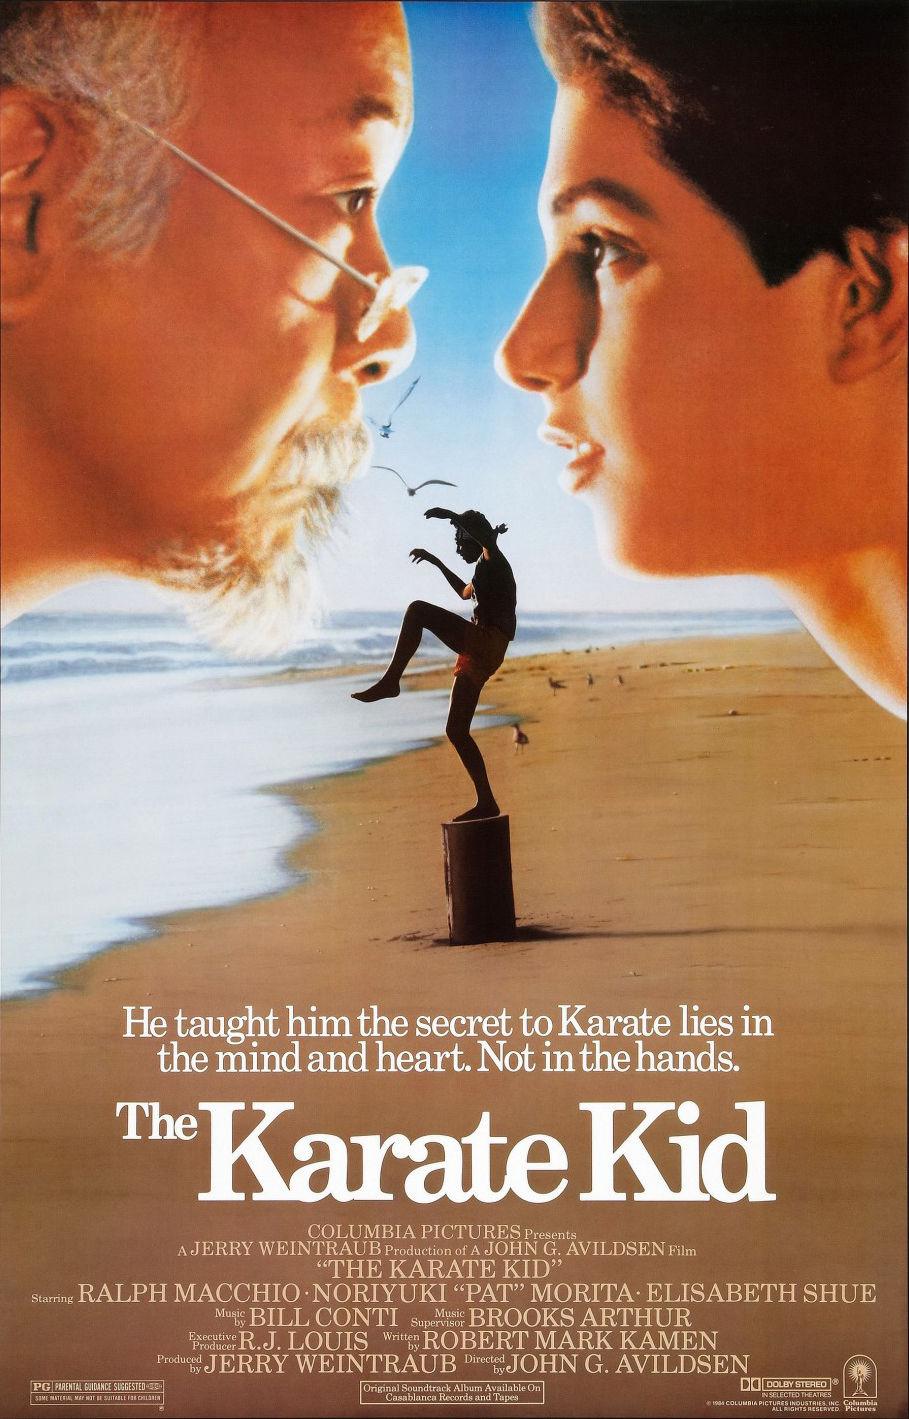 The Karate Kid (1984) movie poster